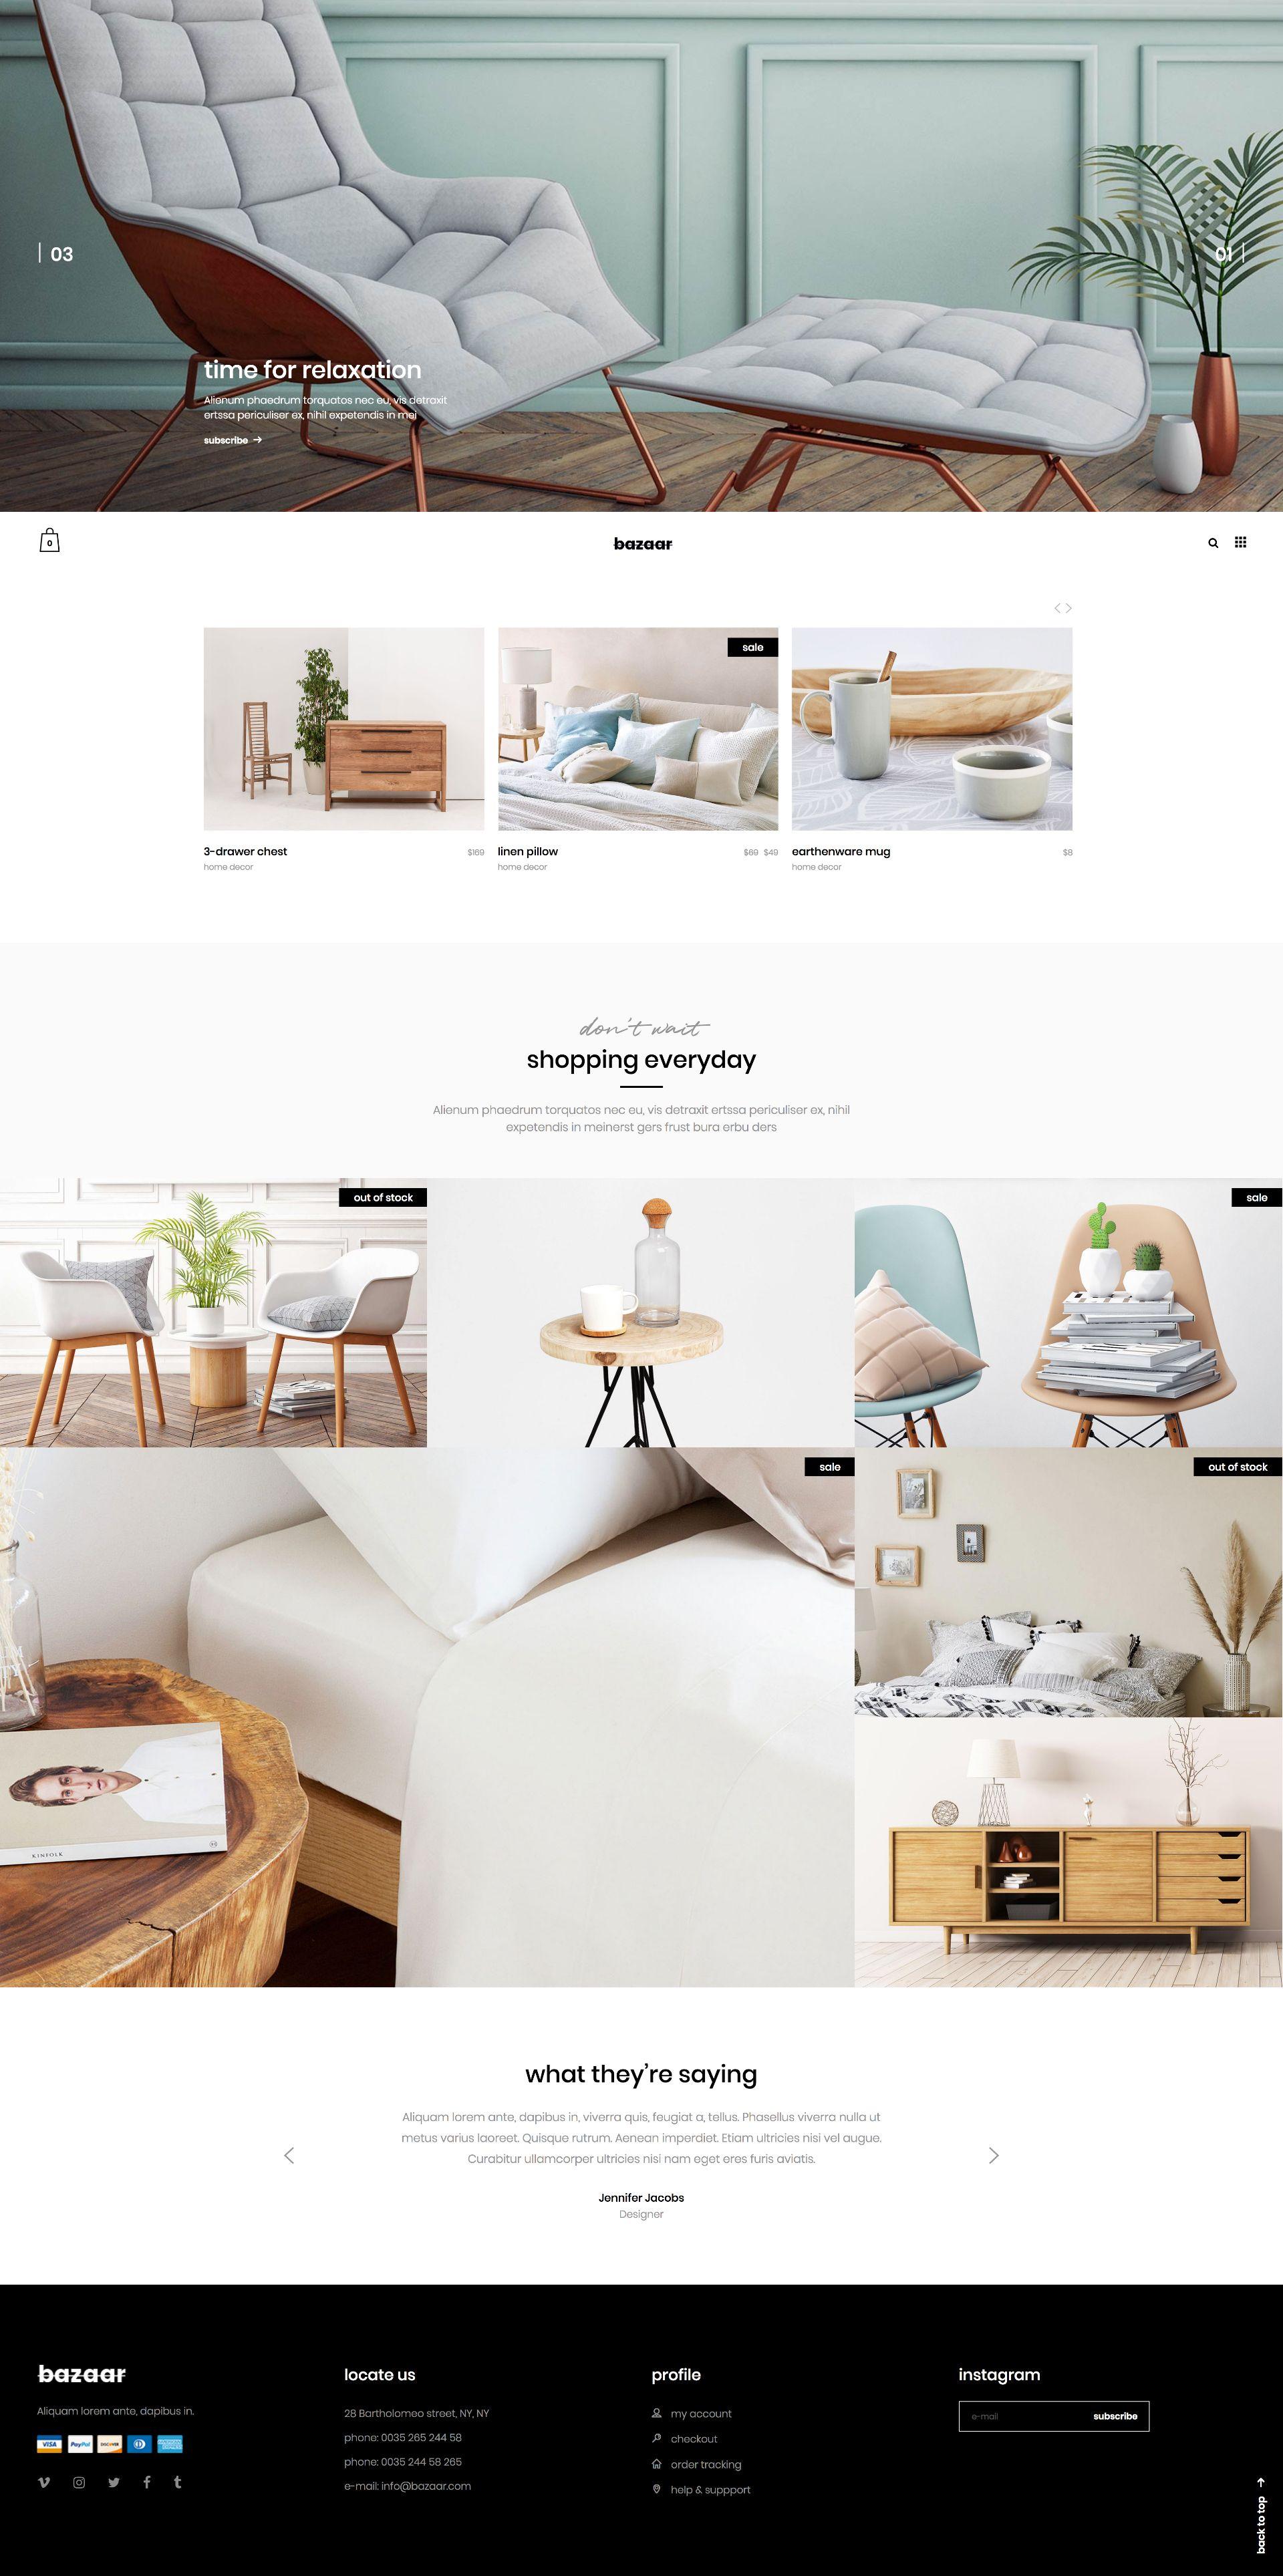 Bazaar Ecommerce Theme Best Interior Design Websites Home Decor Shops Best Home Interior Design